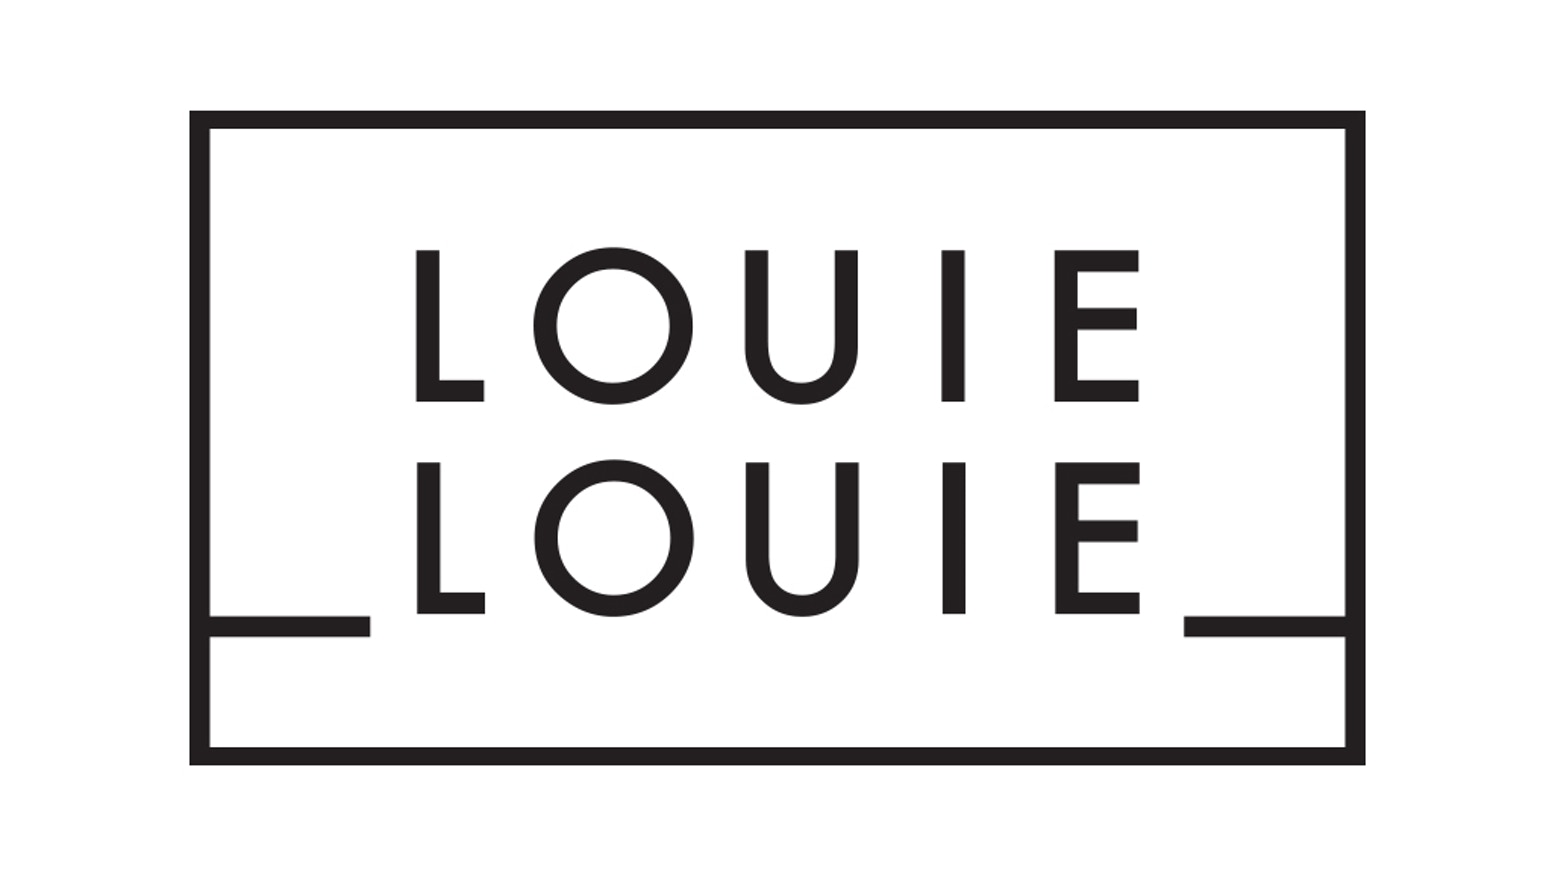 Louie Louie cafe bar by Chris, Jack & Hanne — Kickstarter